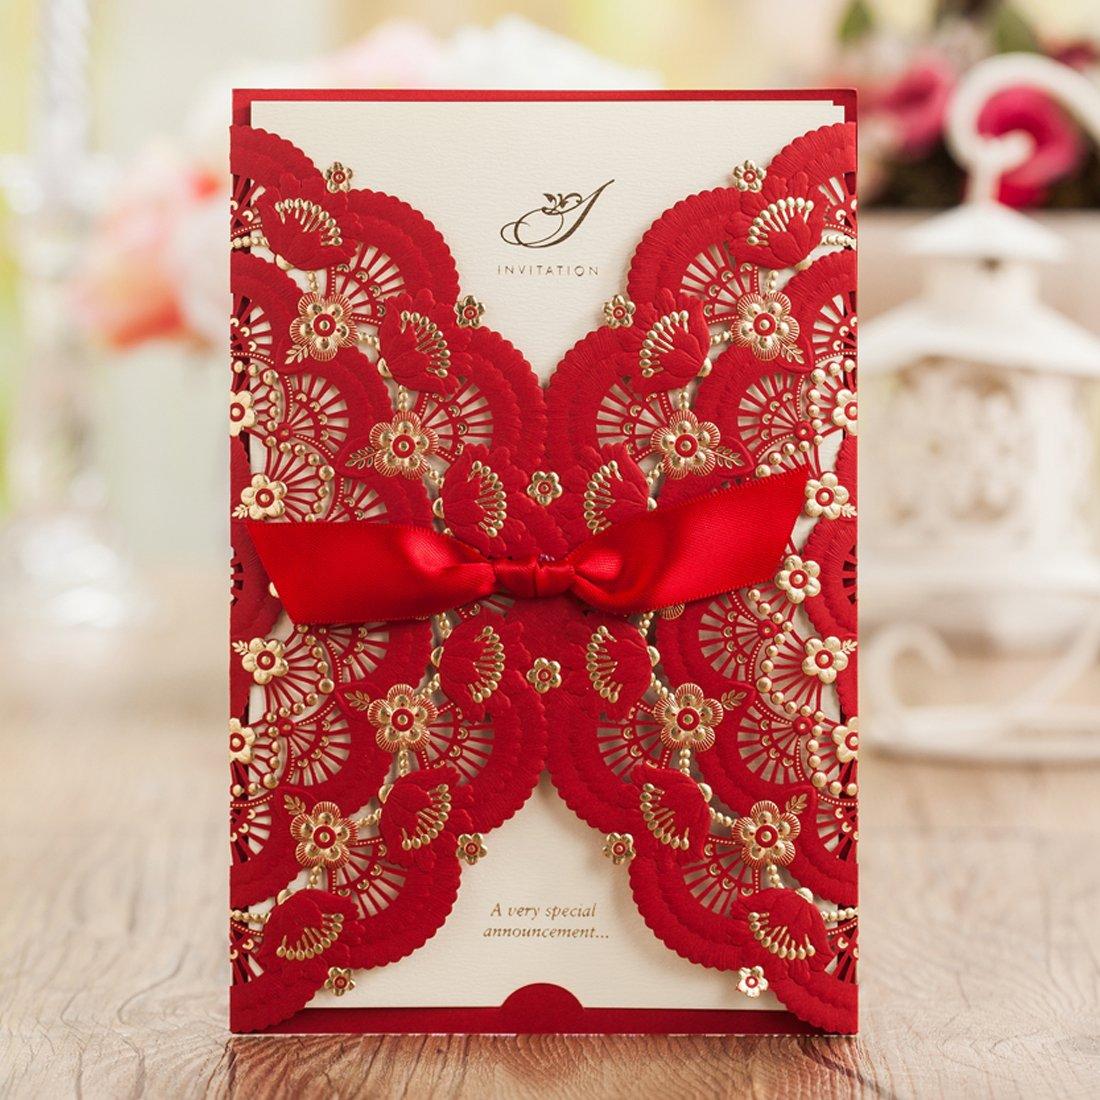 Amazon wishmade 50x elegant red laser cut wedding invitations amazon wishmade 50x elegant red laser cut wedding invitations cards with lace and hollow pattern cardstock for baby shower bridal shower engagement stopboris Images